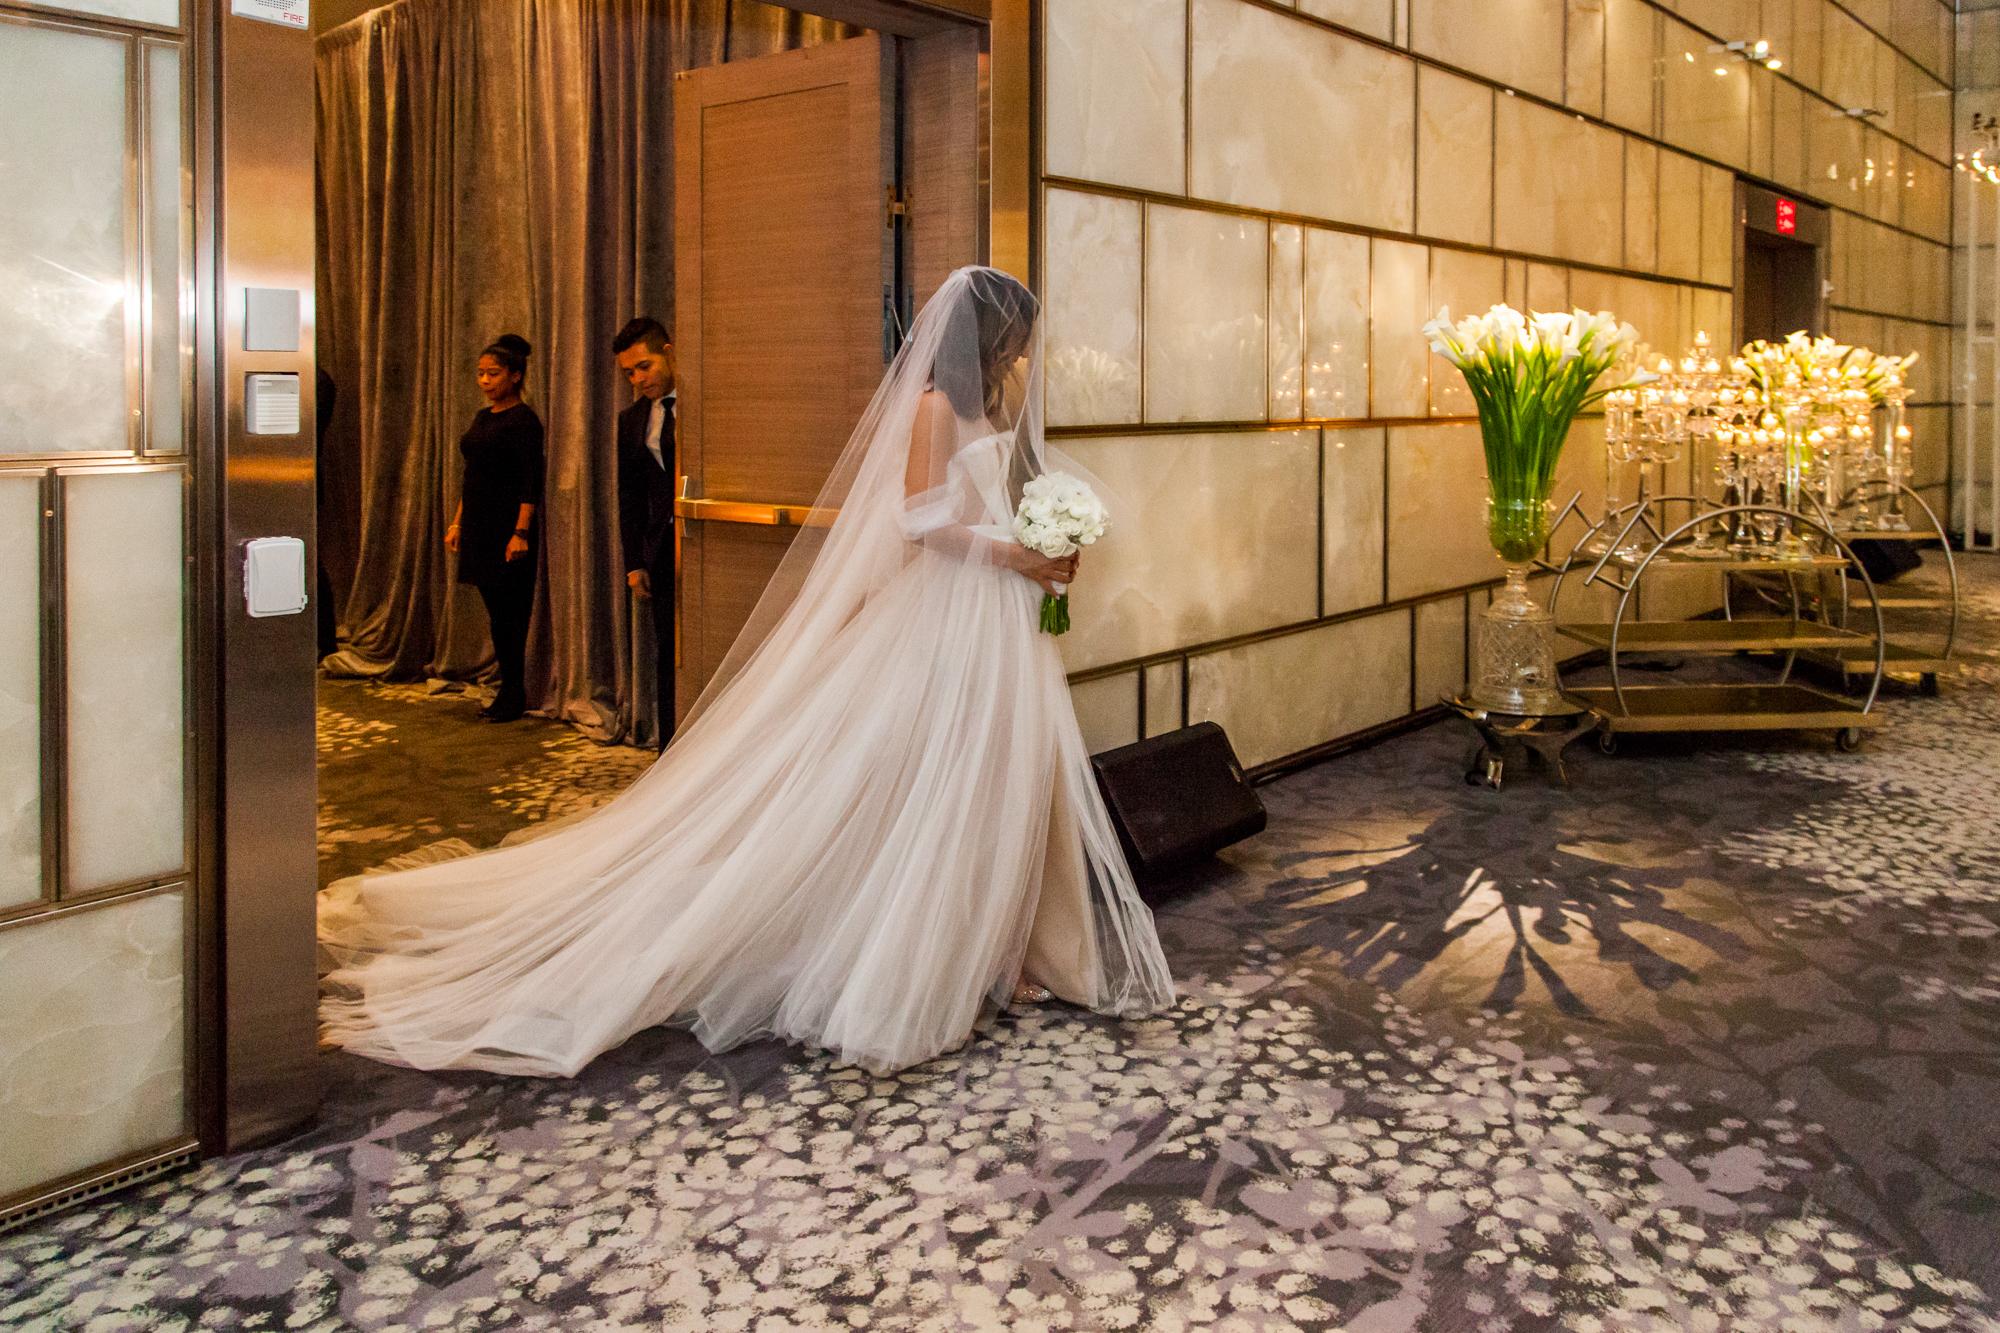 terri-diamond-photography-wedding_2619.jpg